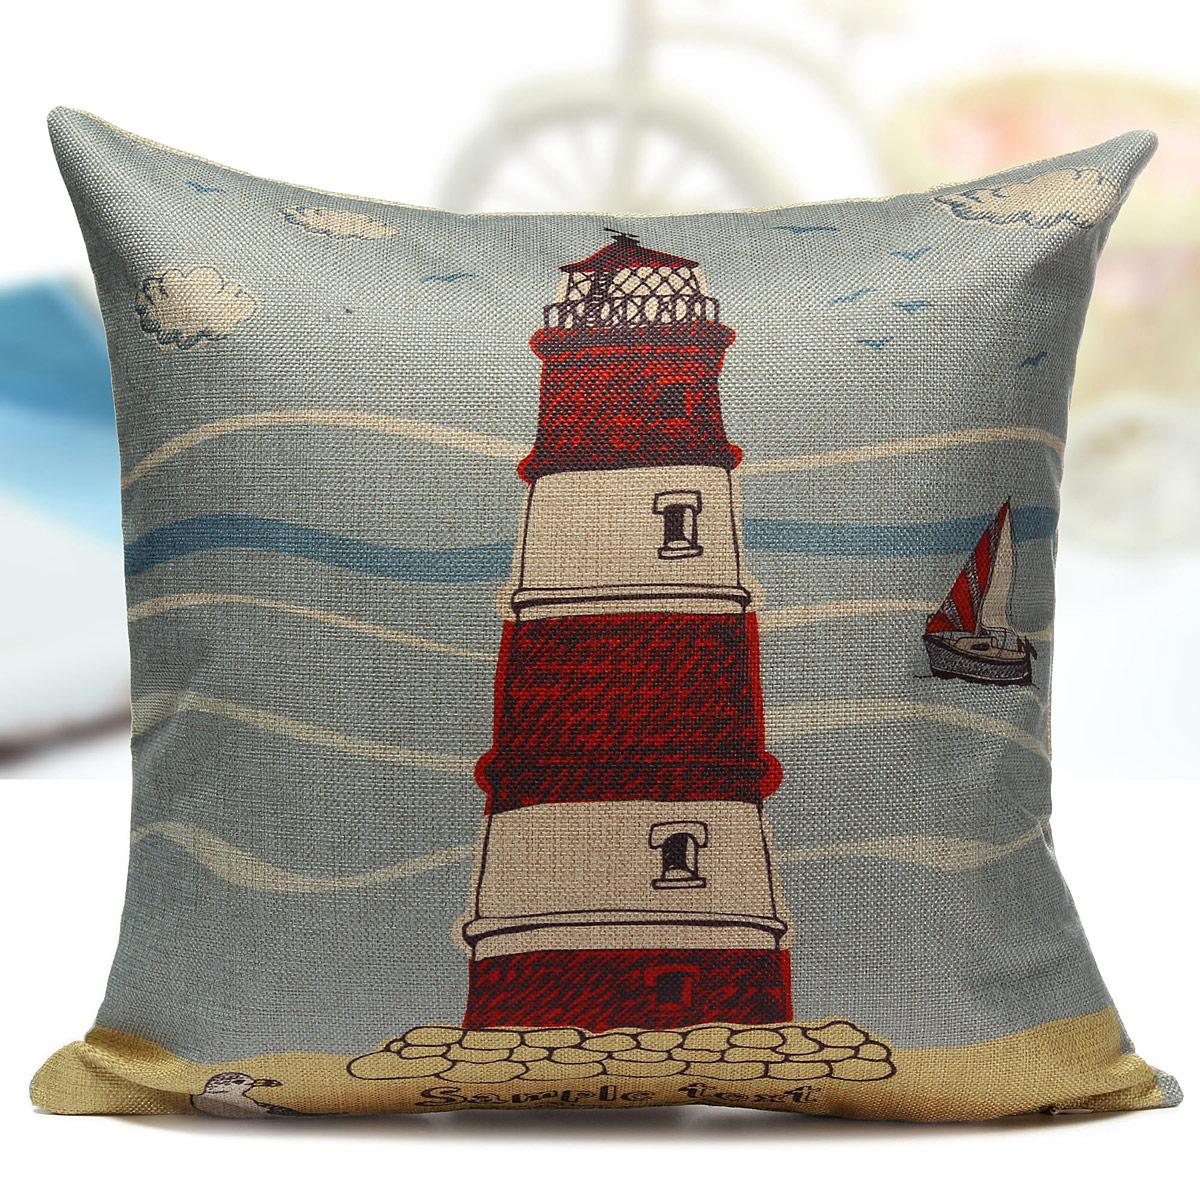 Linen Ocean Sailing Boat Throw Pillow Case Car Back Cushion Cover Home Decor